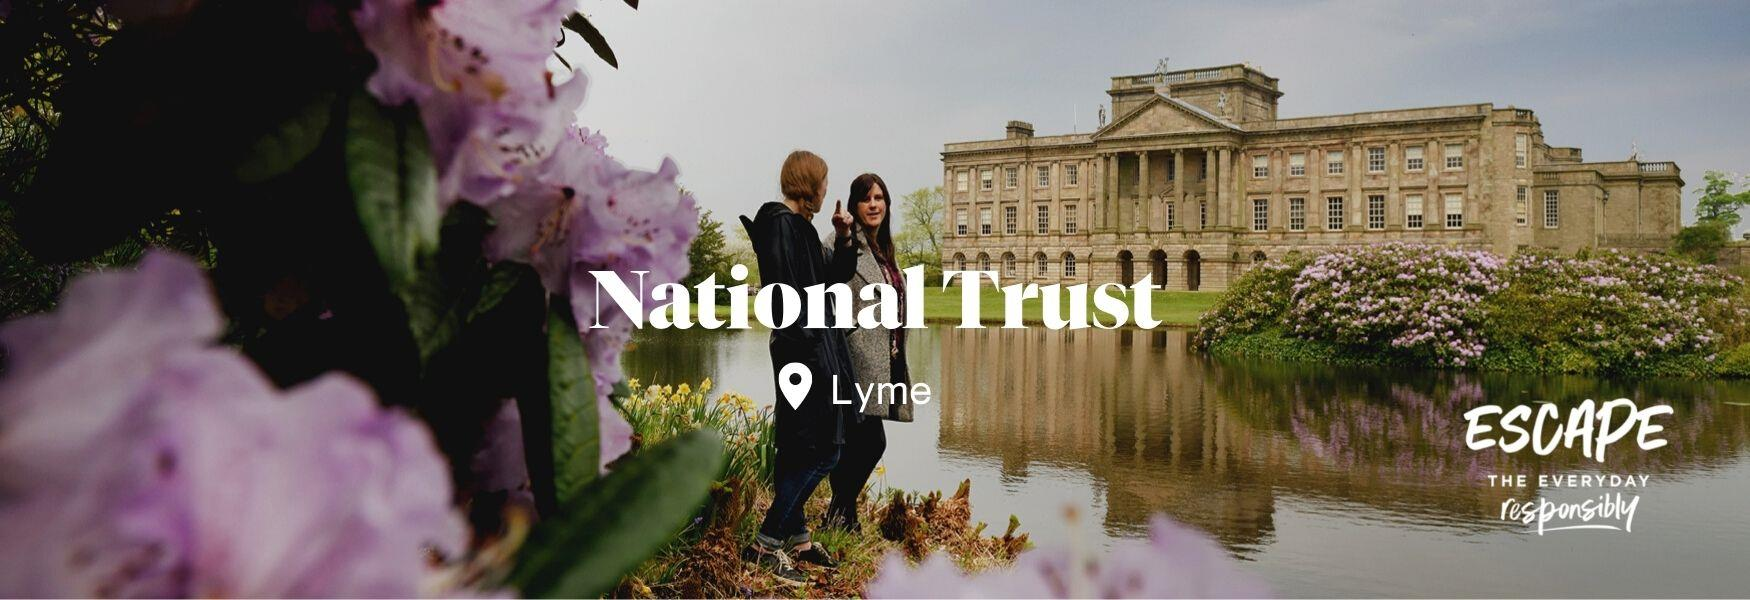 Lyme, National Trust